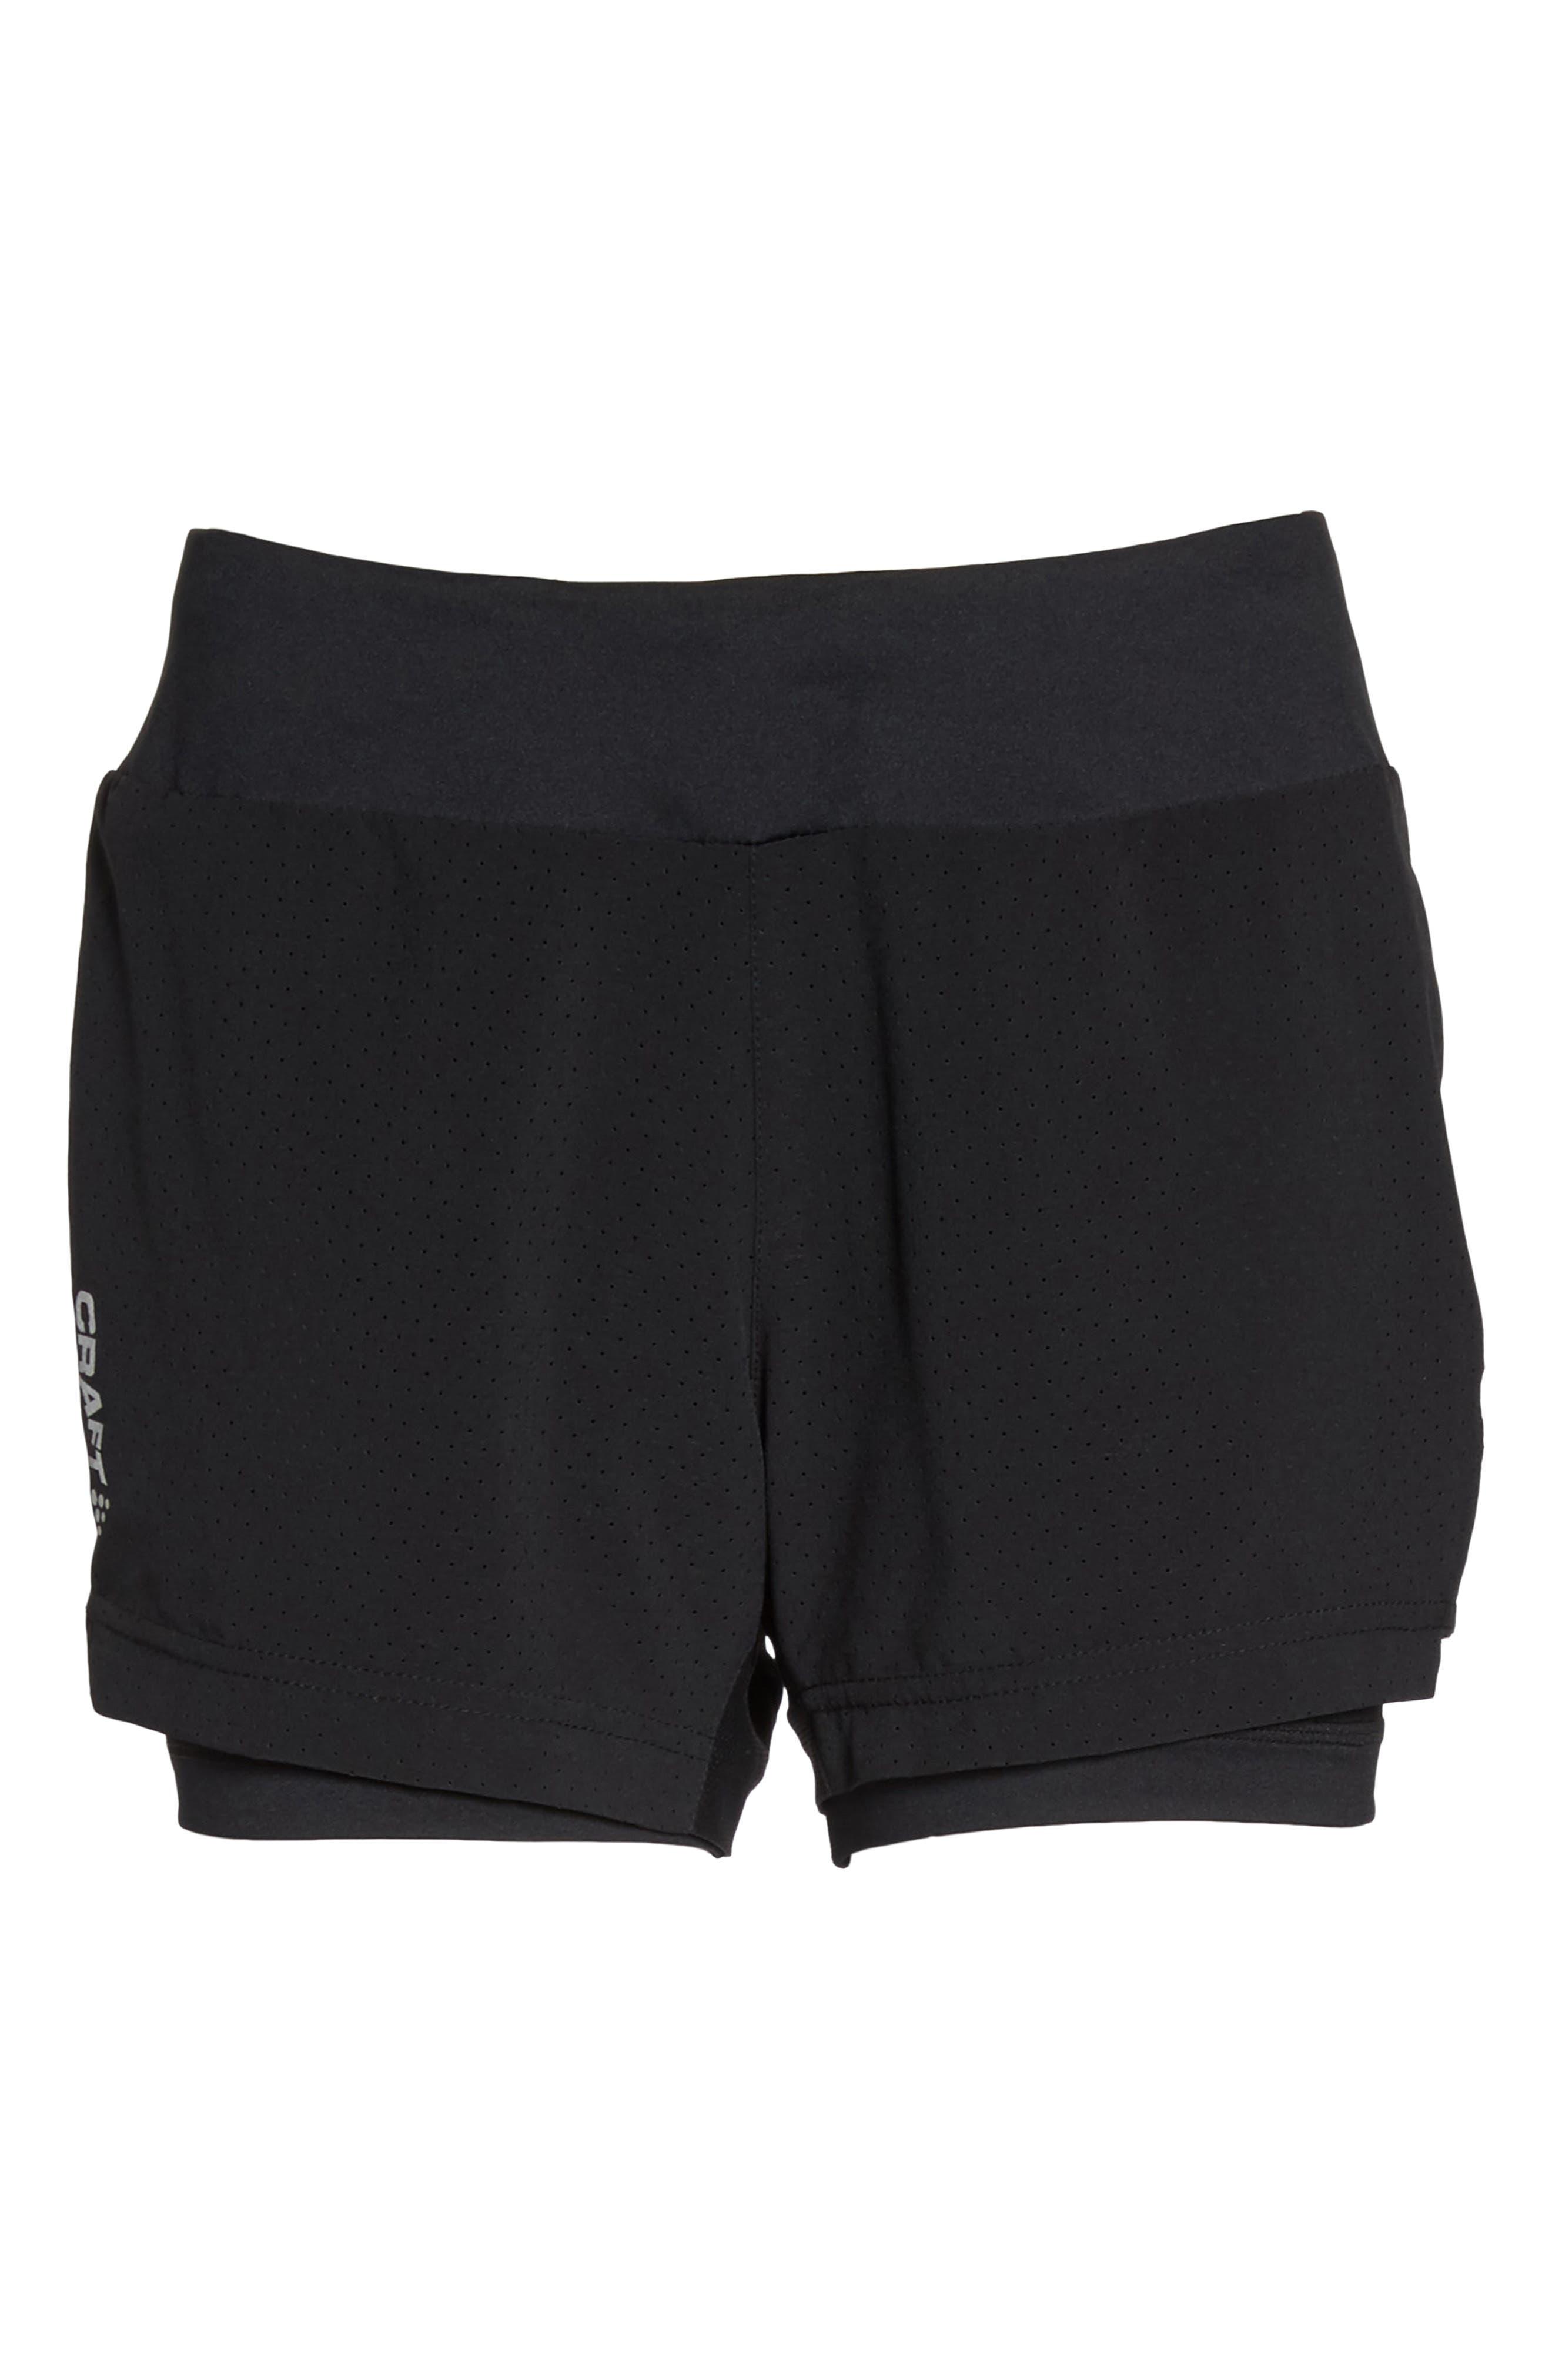 Breakaway 2-in-1 Shorts,                             Alternate thumbnail 7, color,                             Black